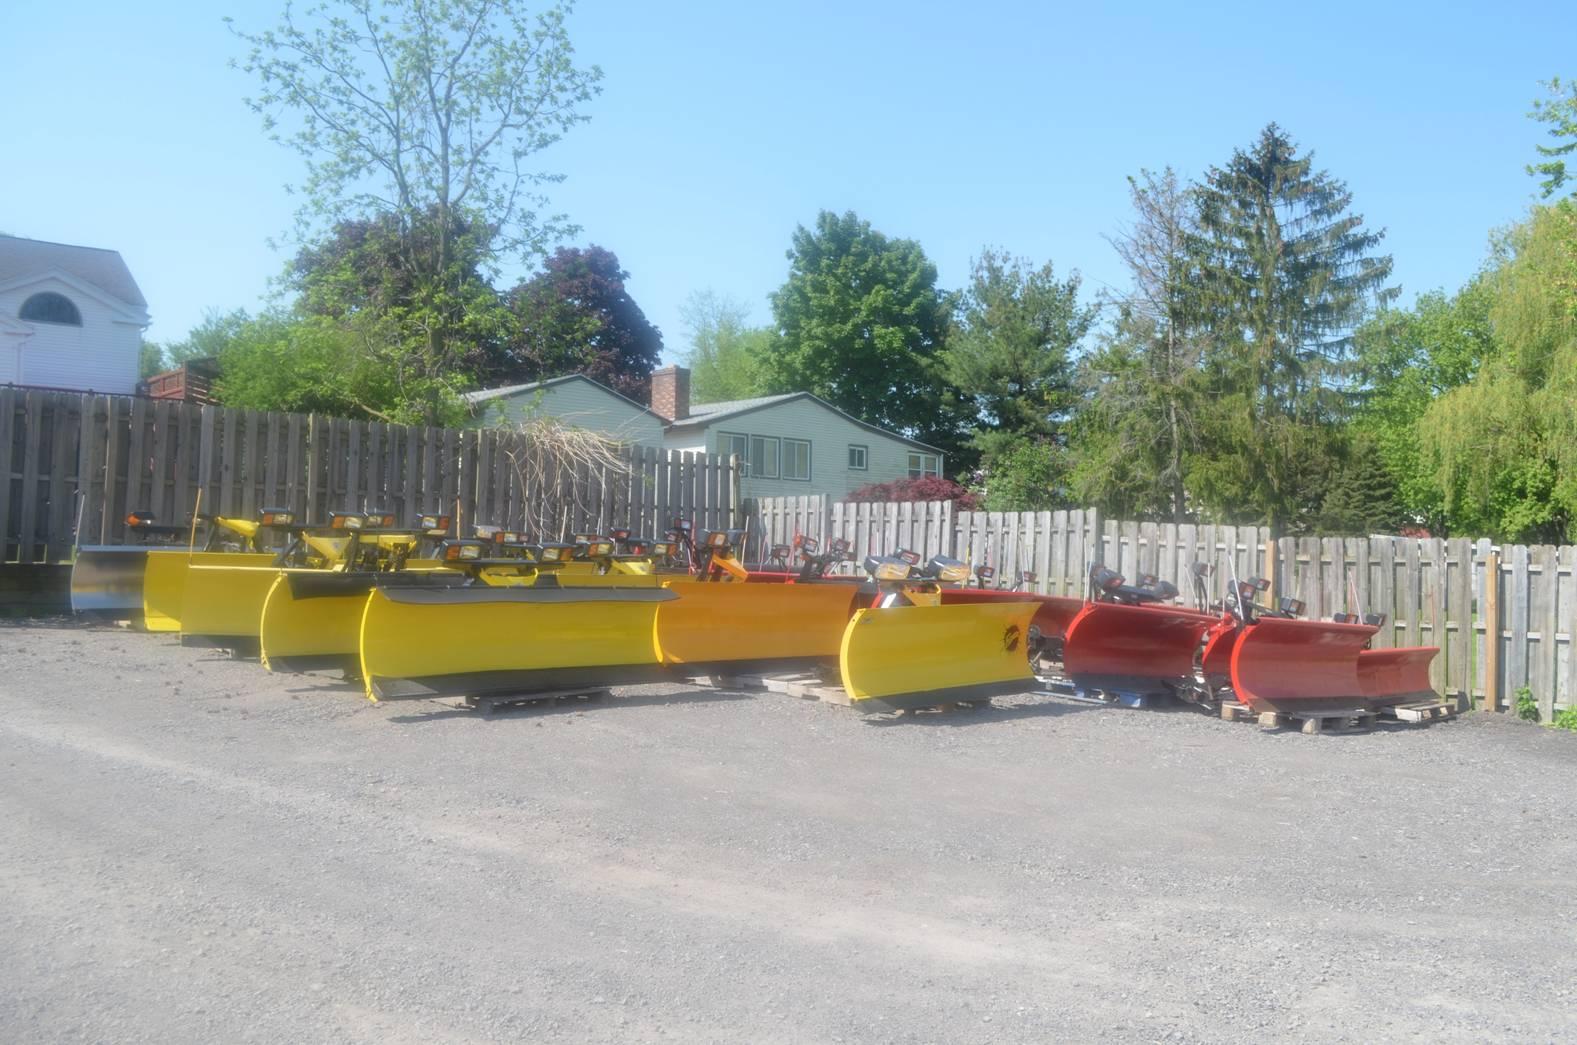 New and Refurbished Snow Plows - JME Automotive - Ontario NY